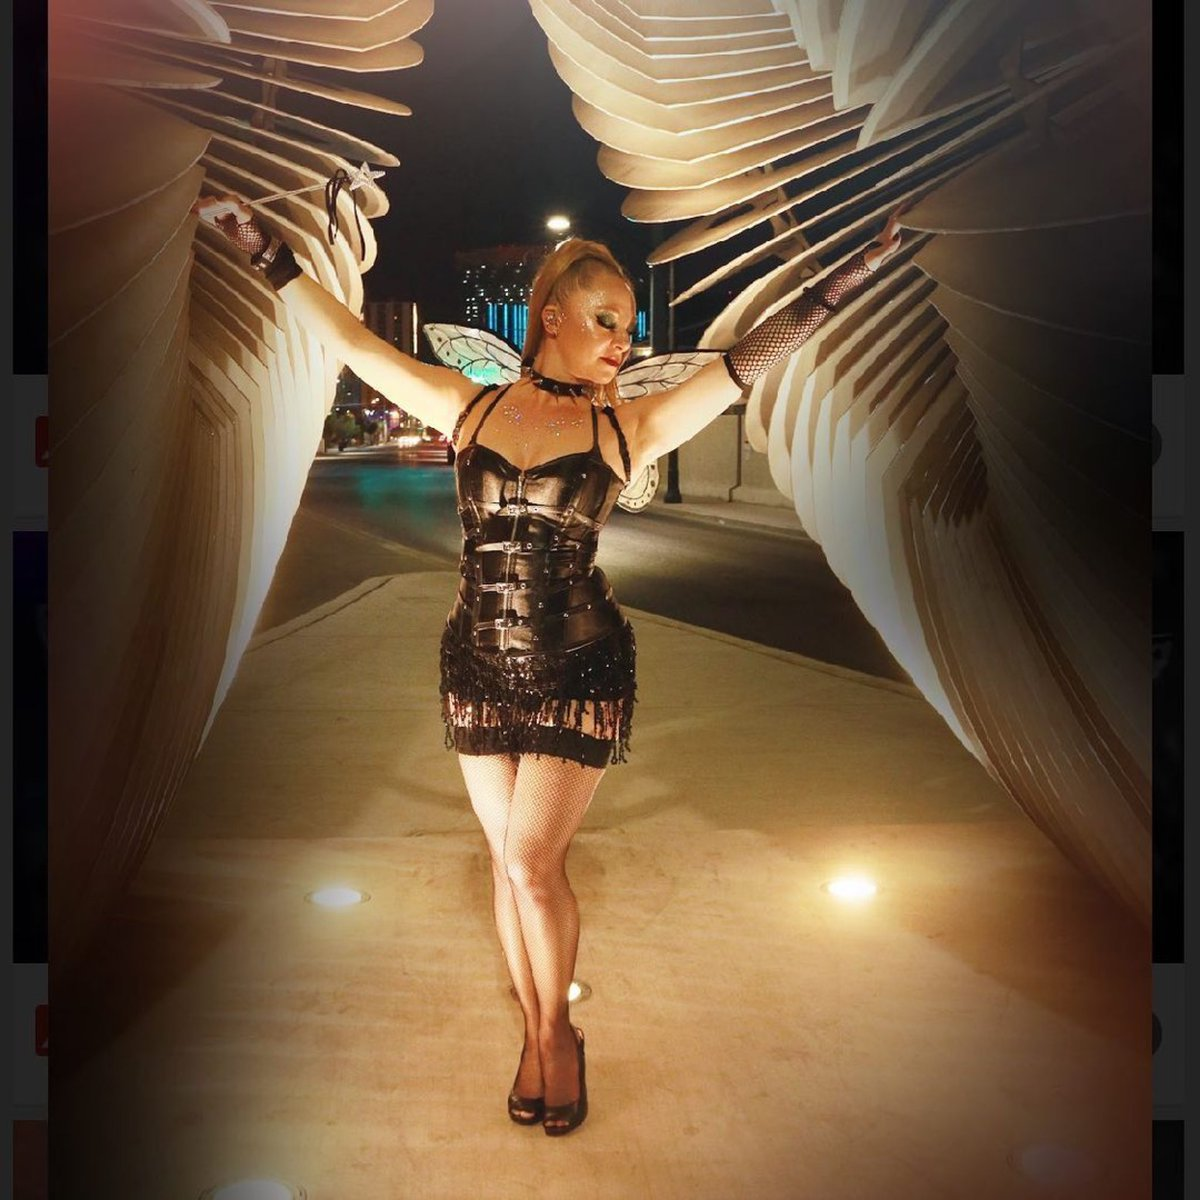 TINKERBELL'S DARKER SIDE 🖤 : BABES IN HEELS:  BABES AFTER DARK 💋 : LOVE THIS PIC 🧚🏼 : #halloween2020 #tinkerbell #vegasartsdistrict #dance #dancer #fitnessinstructor #danceinstructor #pilatesinstructor #fitness   #nightphotography #photography #vegasphotographer  #naughty https://t.co/BJdTSfYlxT